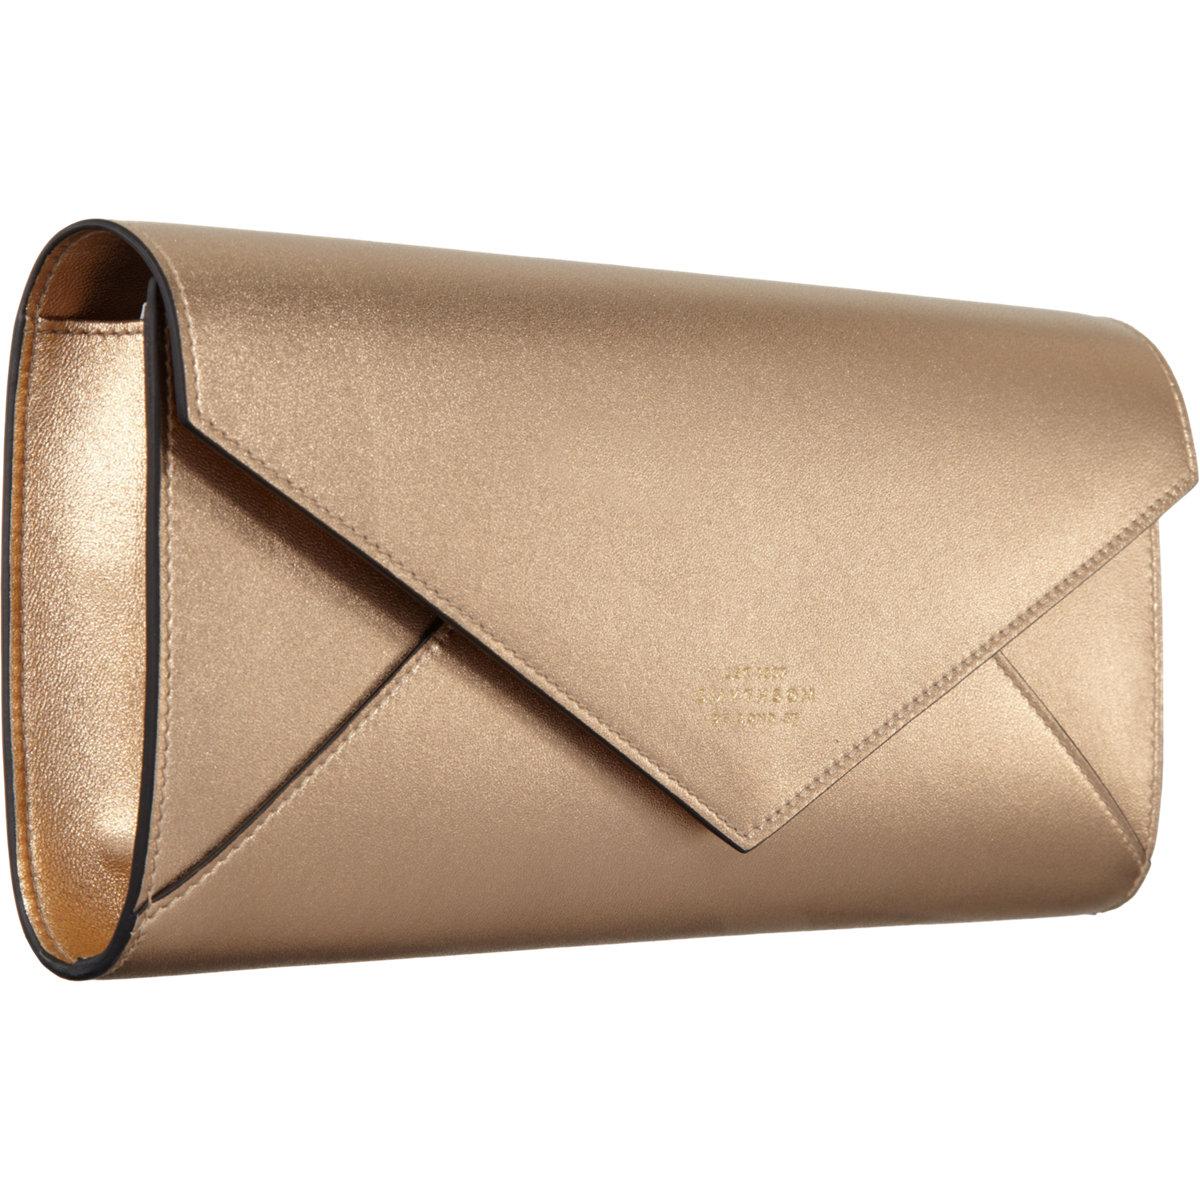 Smythson Envelope Clutch In Metallic Lyst